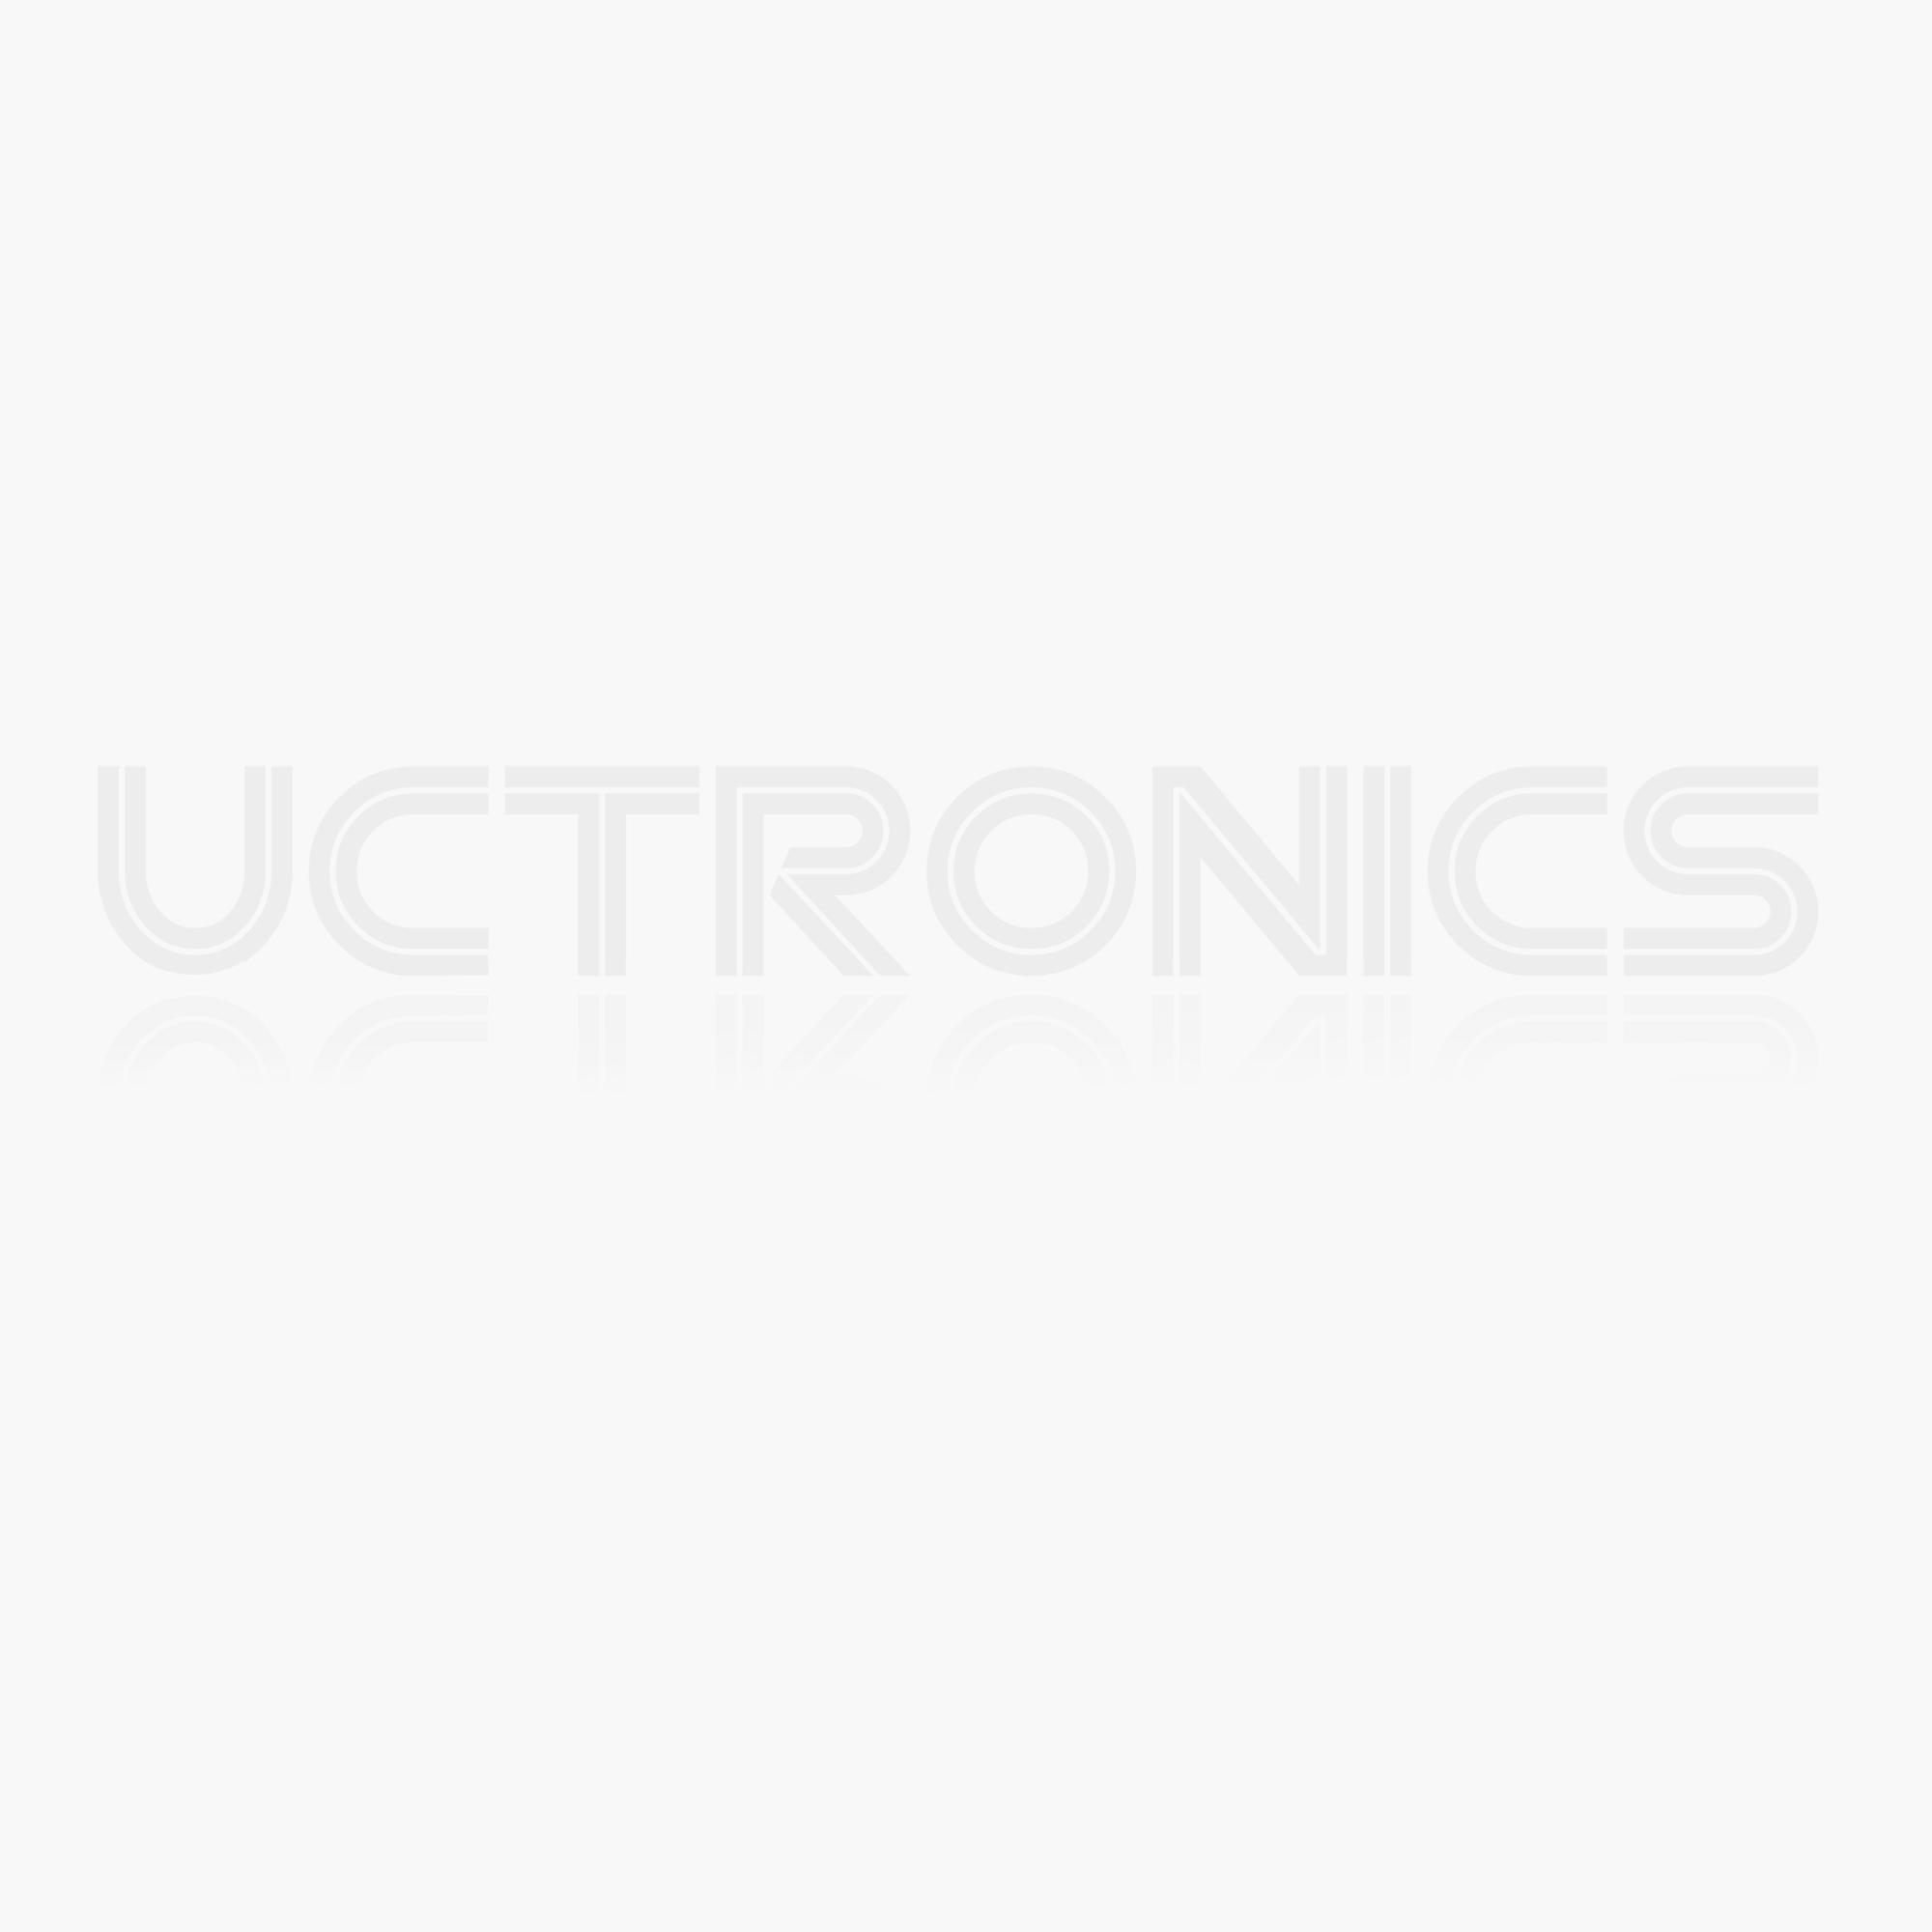 OV2640 2Mp HD CMOS Camera Module /w Adapter Board JPEG OUT